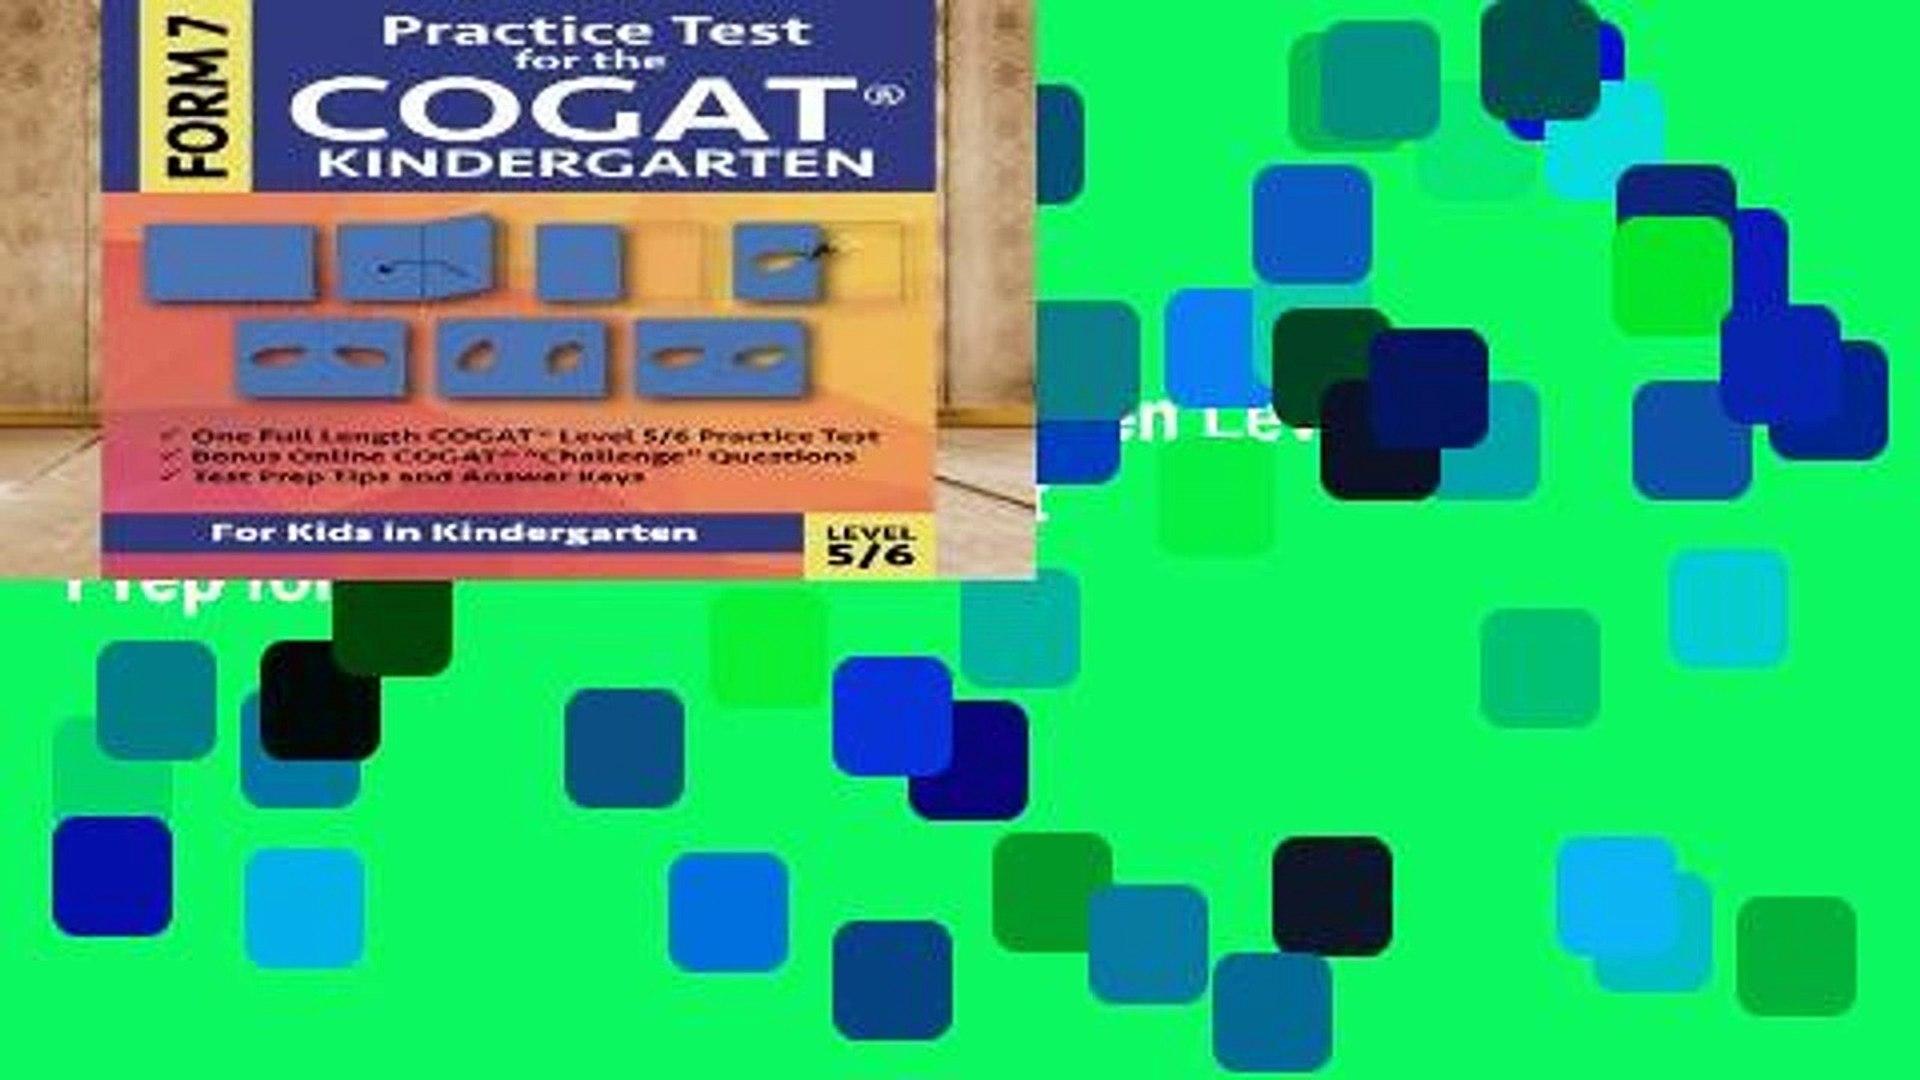 Cogat Form 7 Practice Test Level 56 (kindergarten)